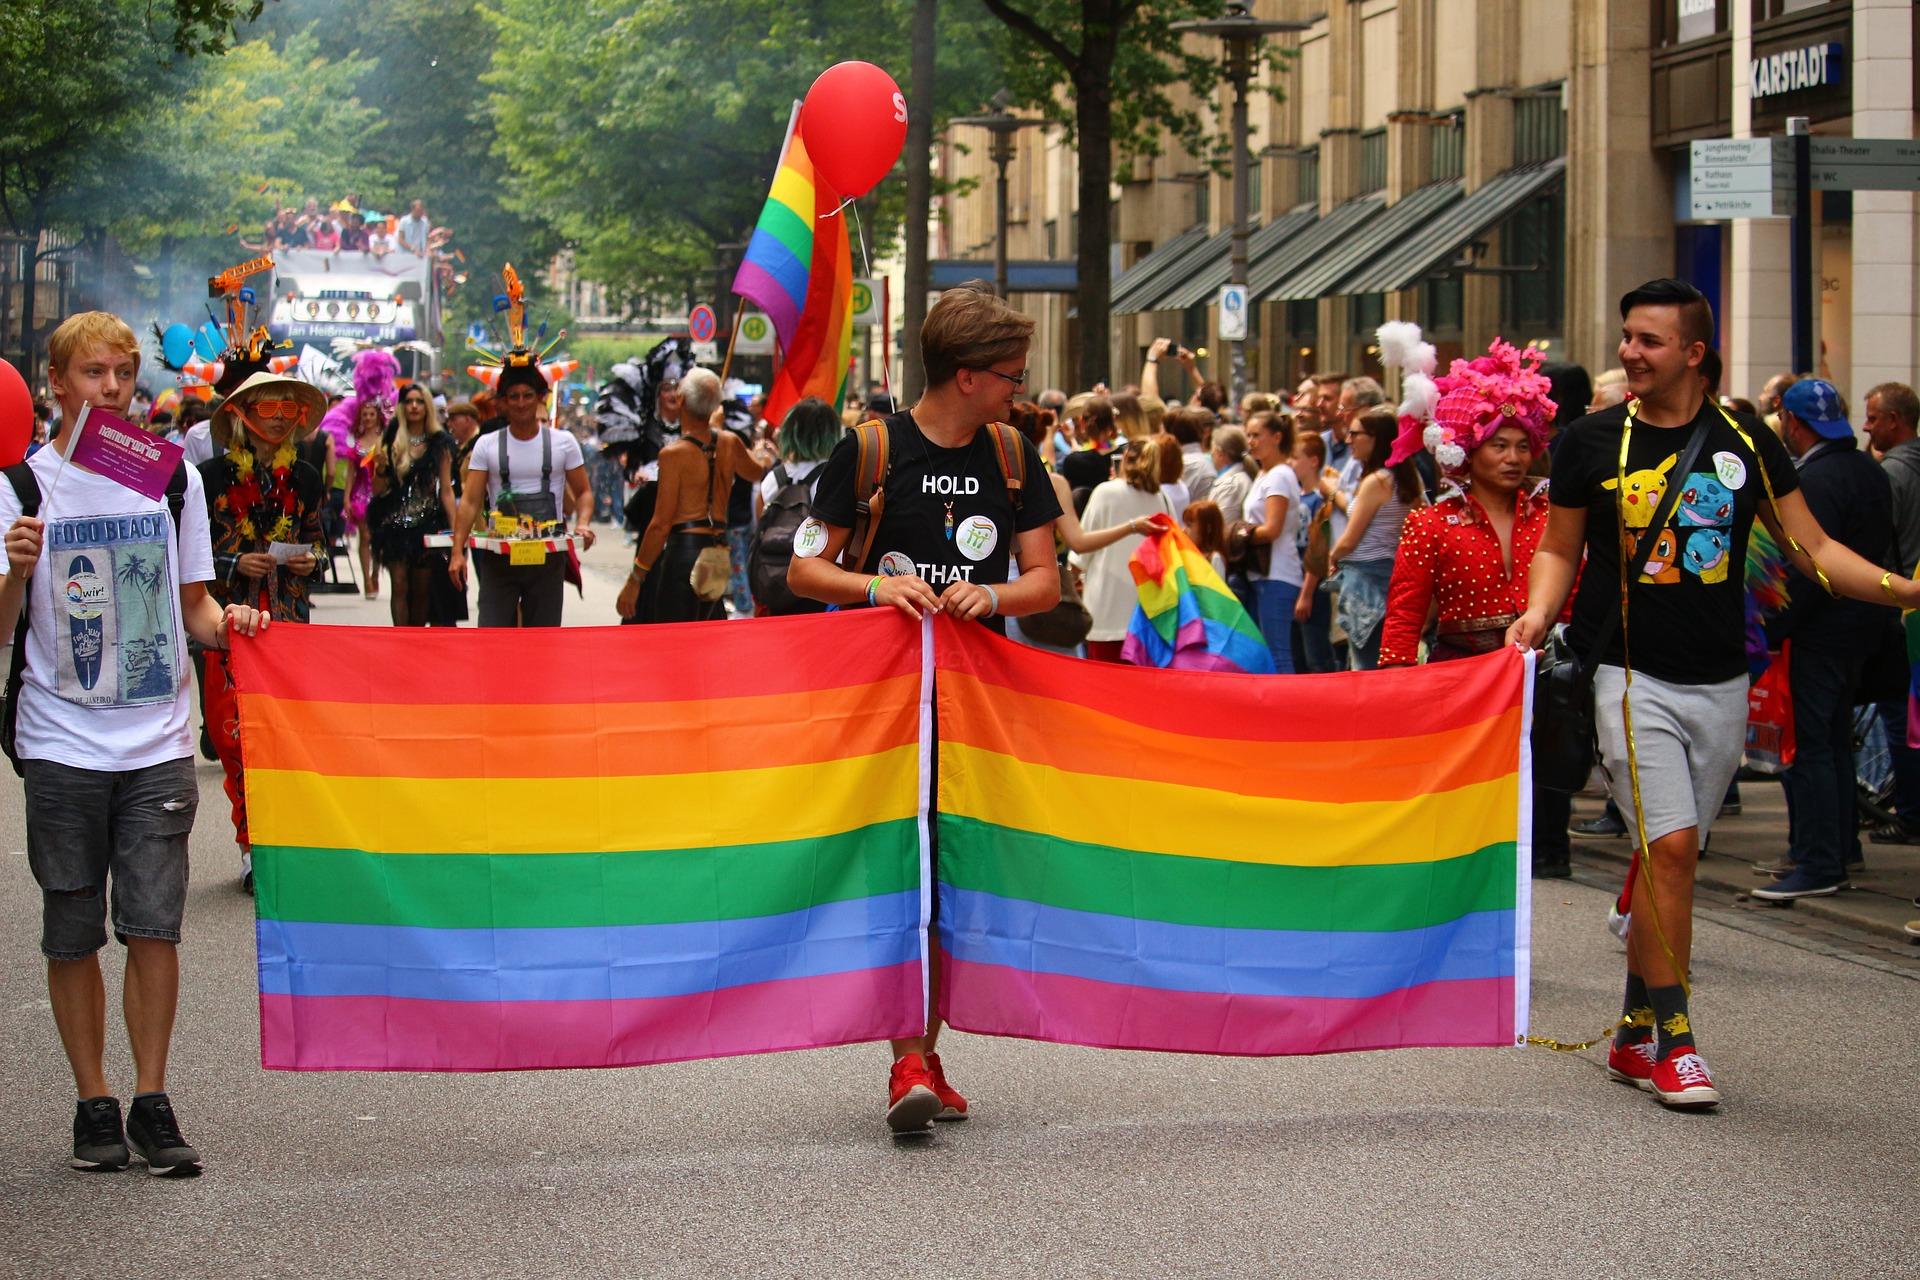 CocoAndre Chocolatier and Texas Latino Pride to host family-friendly Pride event in Oak Cliff